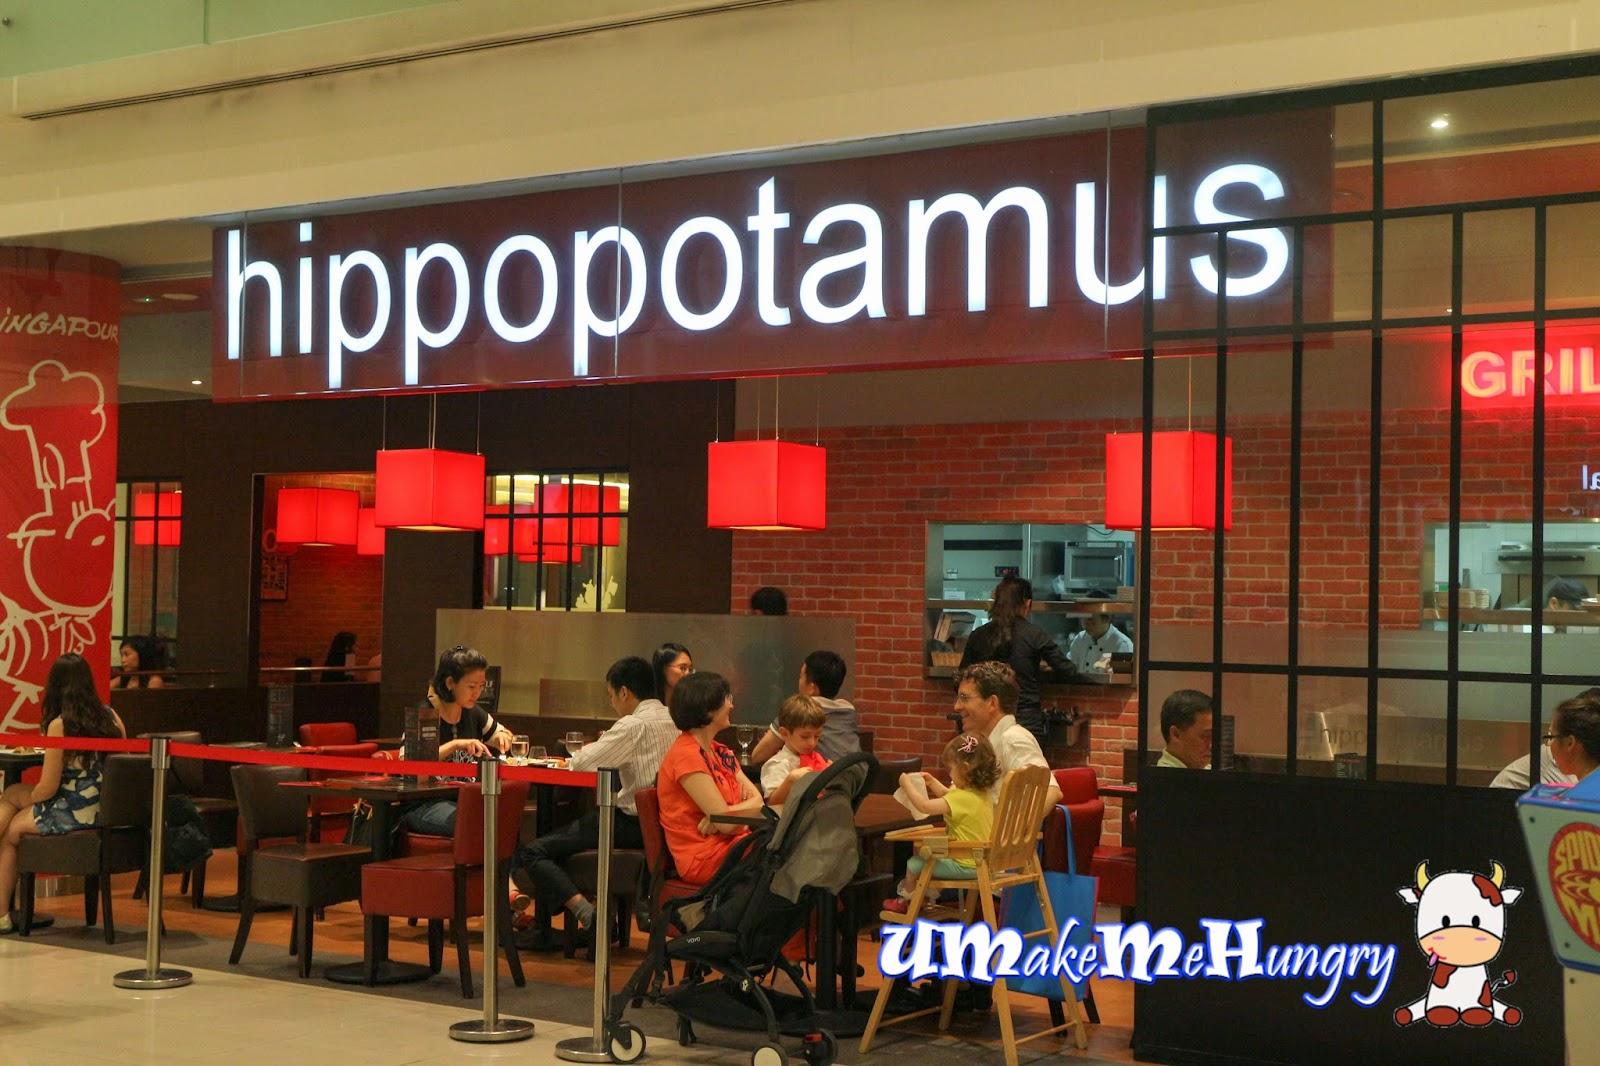 Hippopotamus - Hippopotamus restaurant grill ...